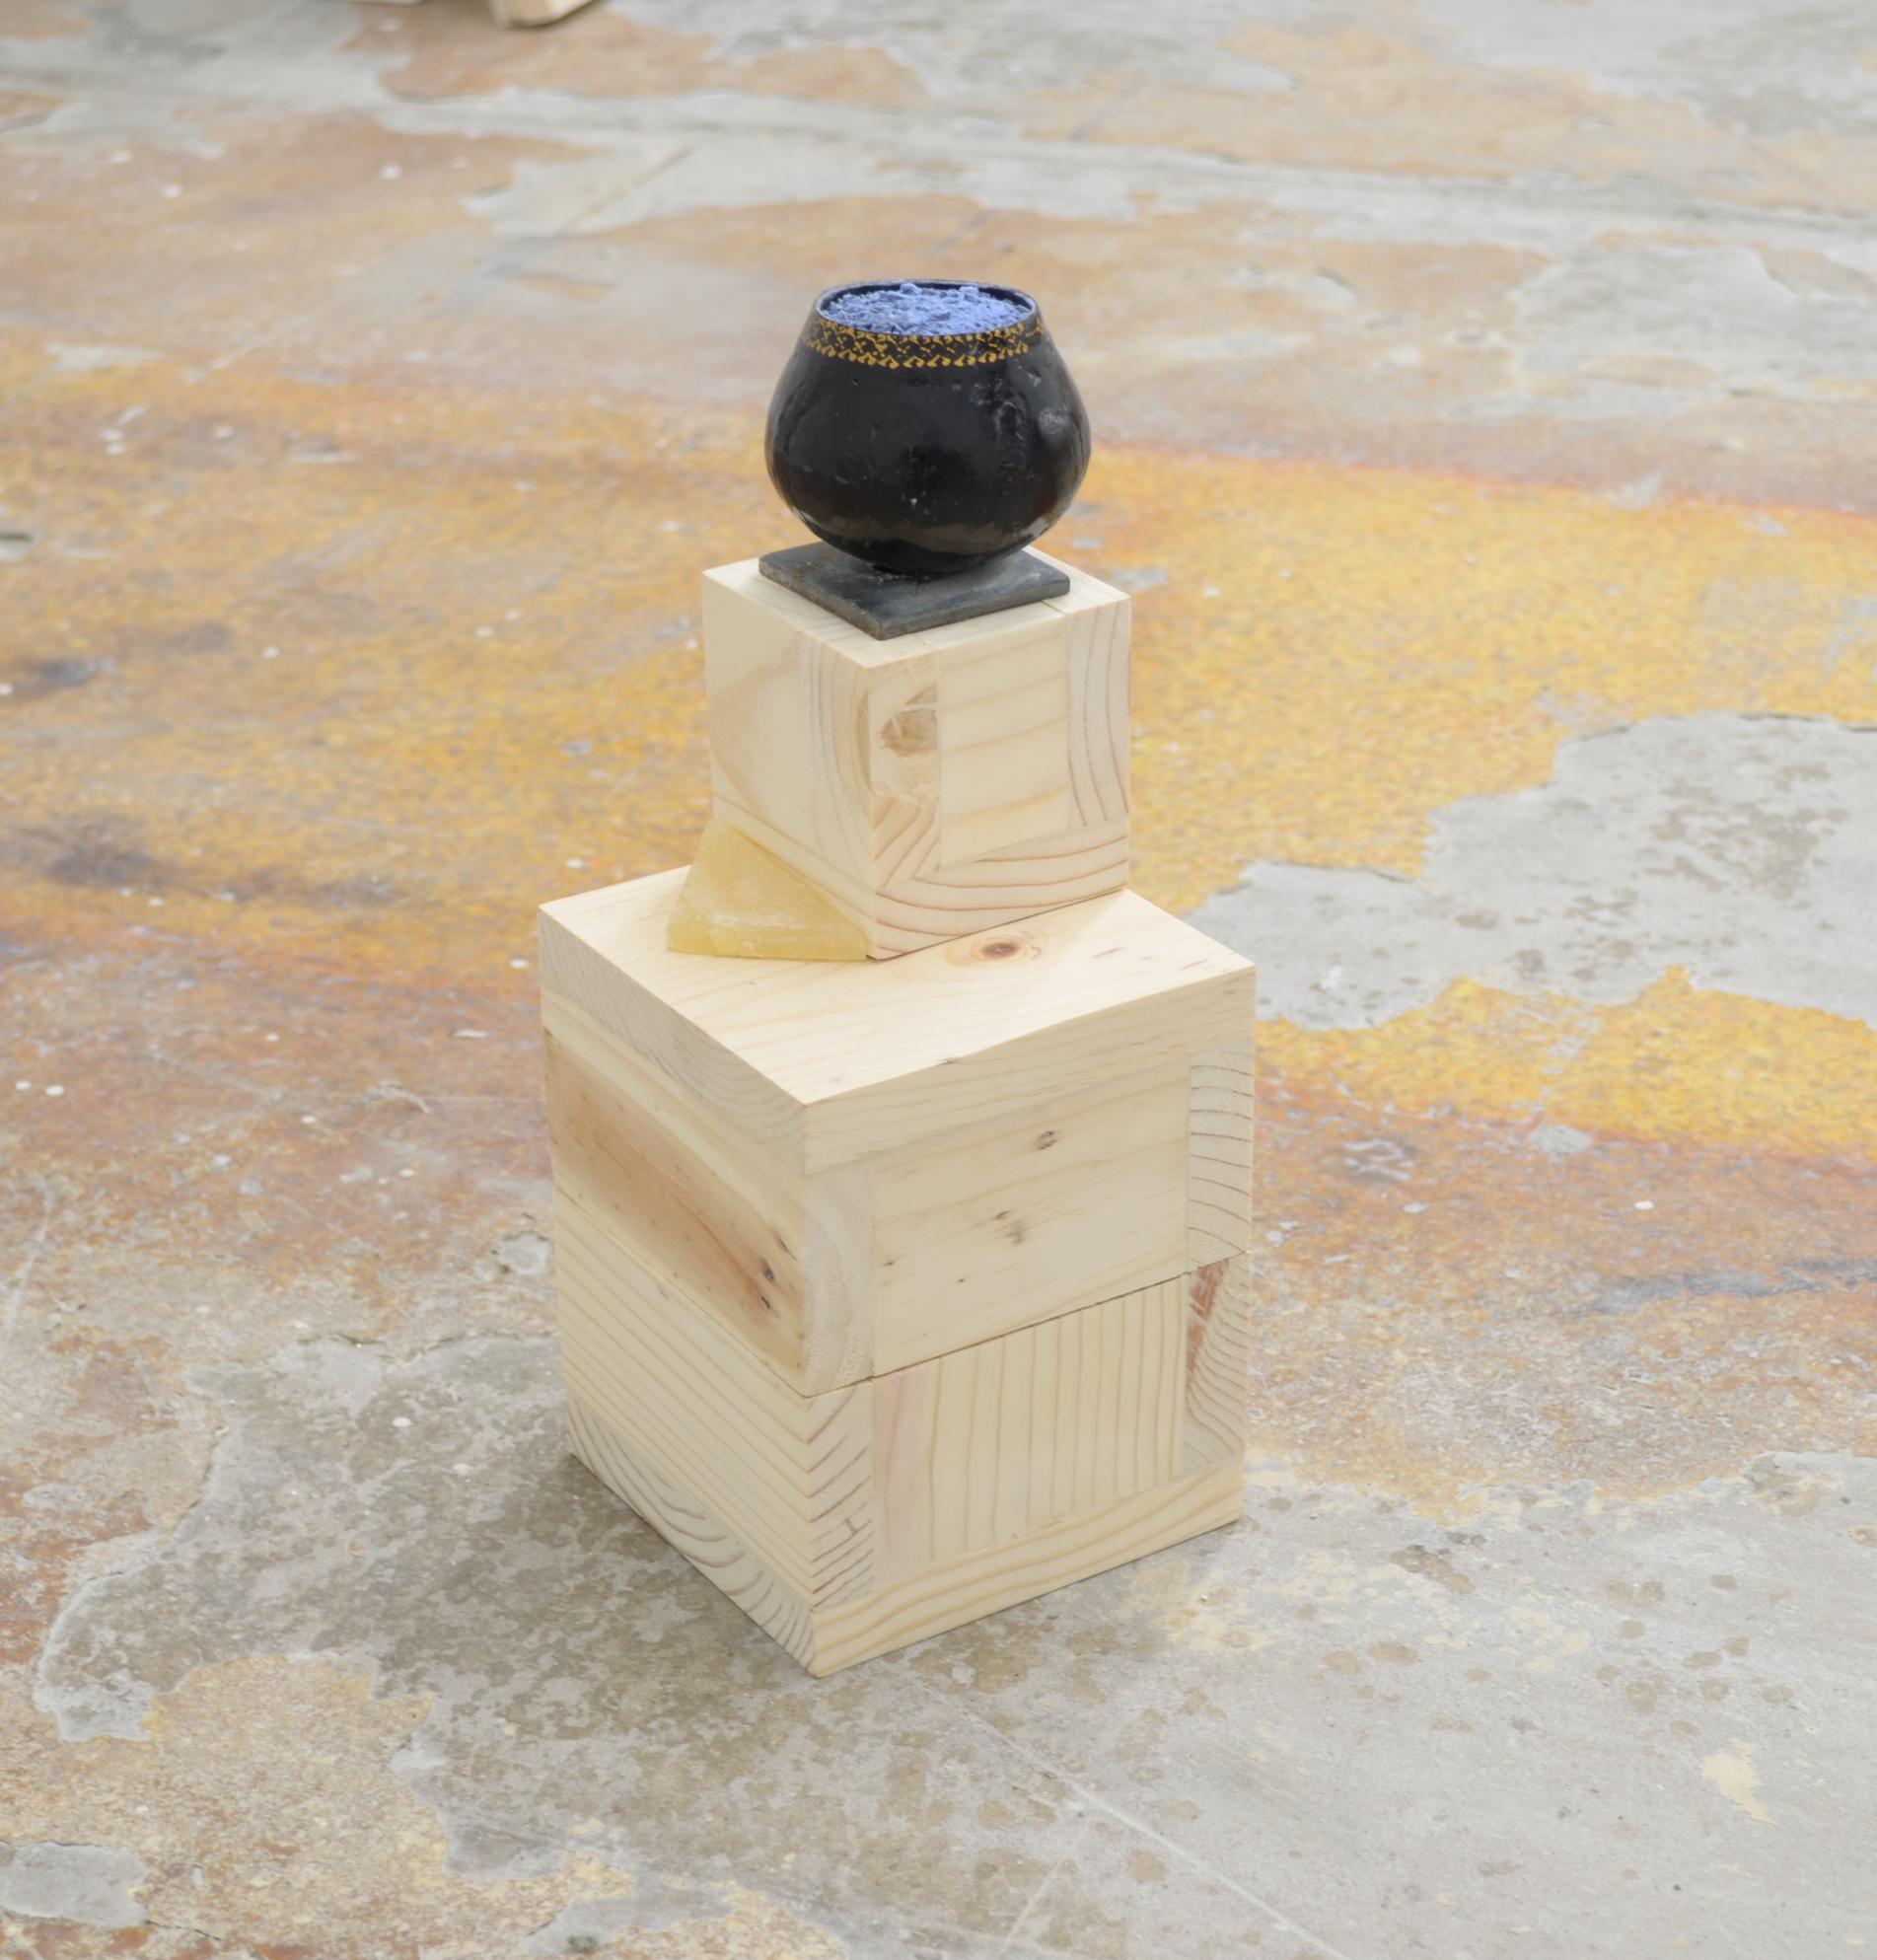 Yanira Collado, Fragment 2 (If they knew these things / Reliquias Ocultadas), 2020, Wood, javon de cuava, javon de jamaica, tin jar, and cotton, 8 x 8 inches